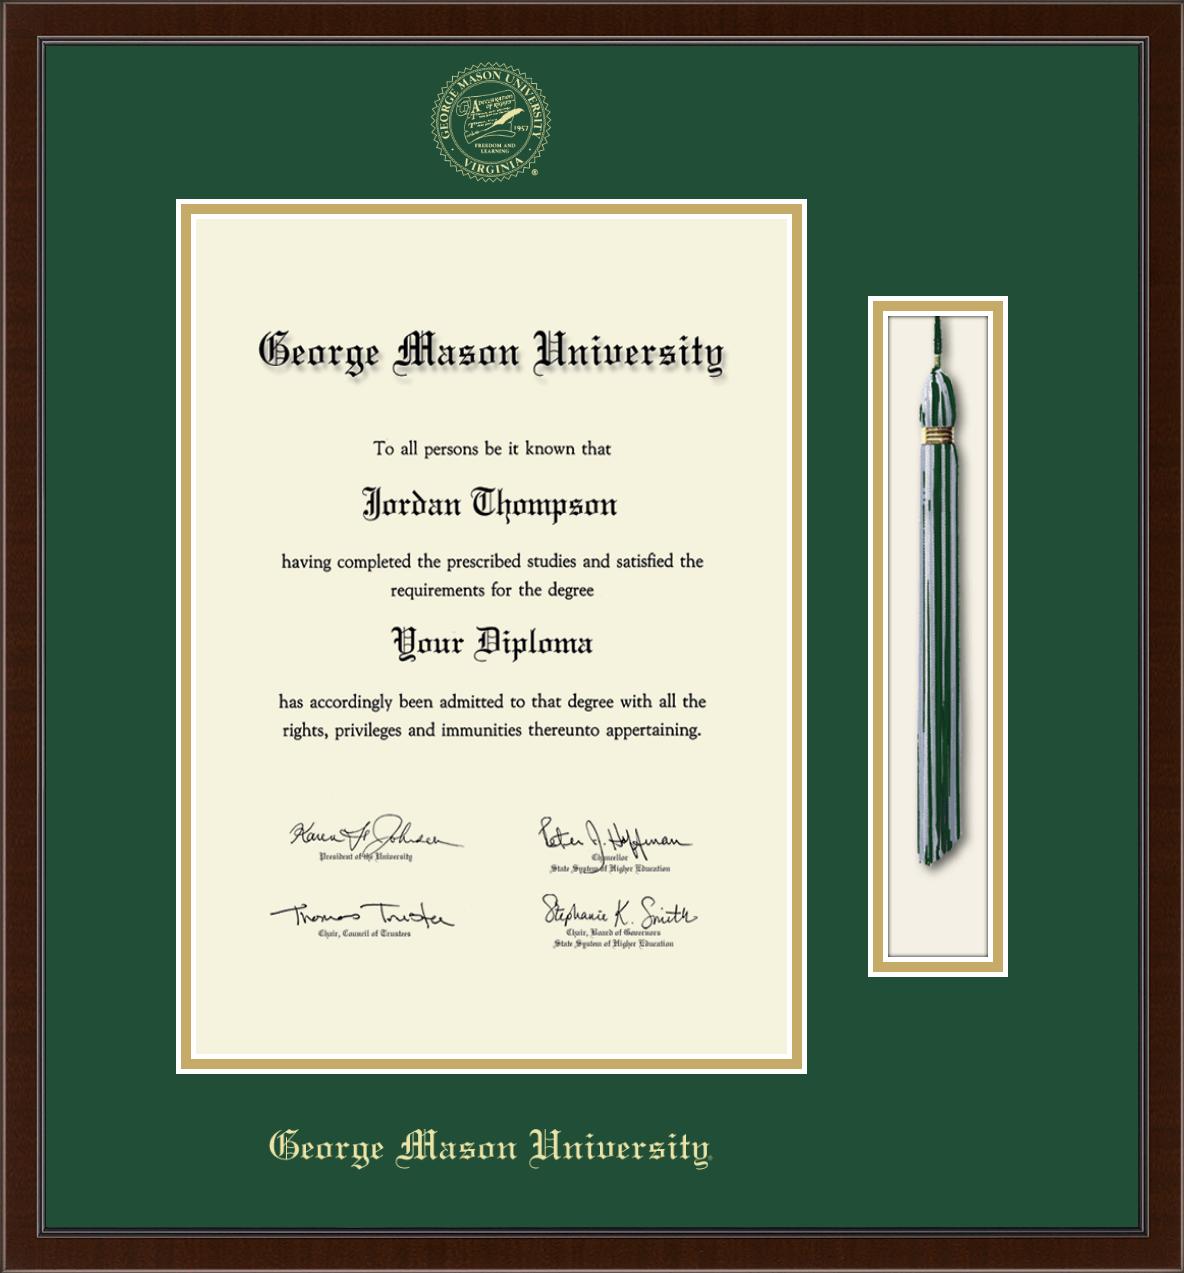 George Mason University Tassel Edition Diploma Frame In Delta Item 321583 From George Mason University Bookstore